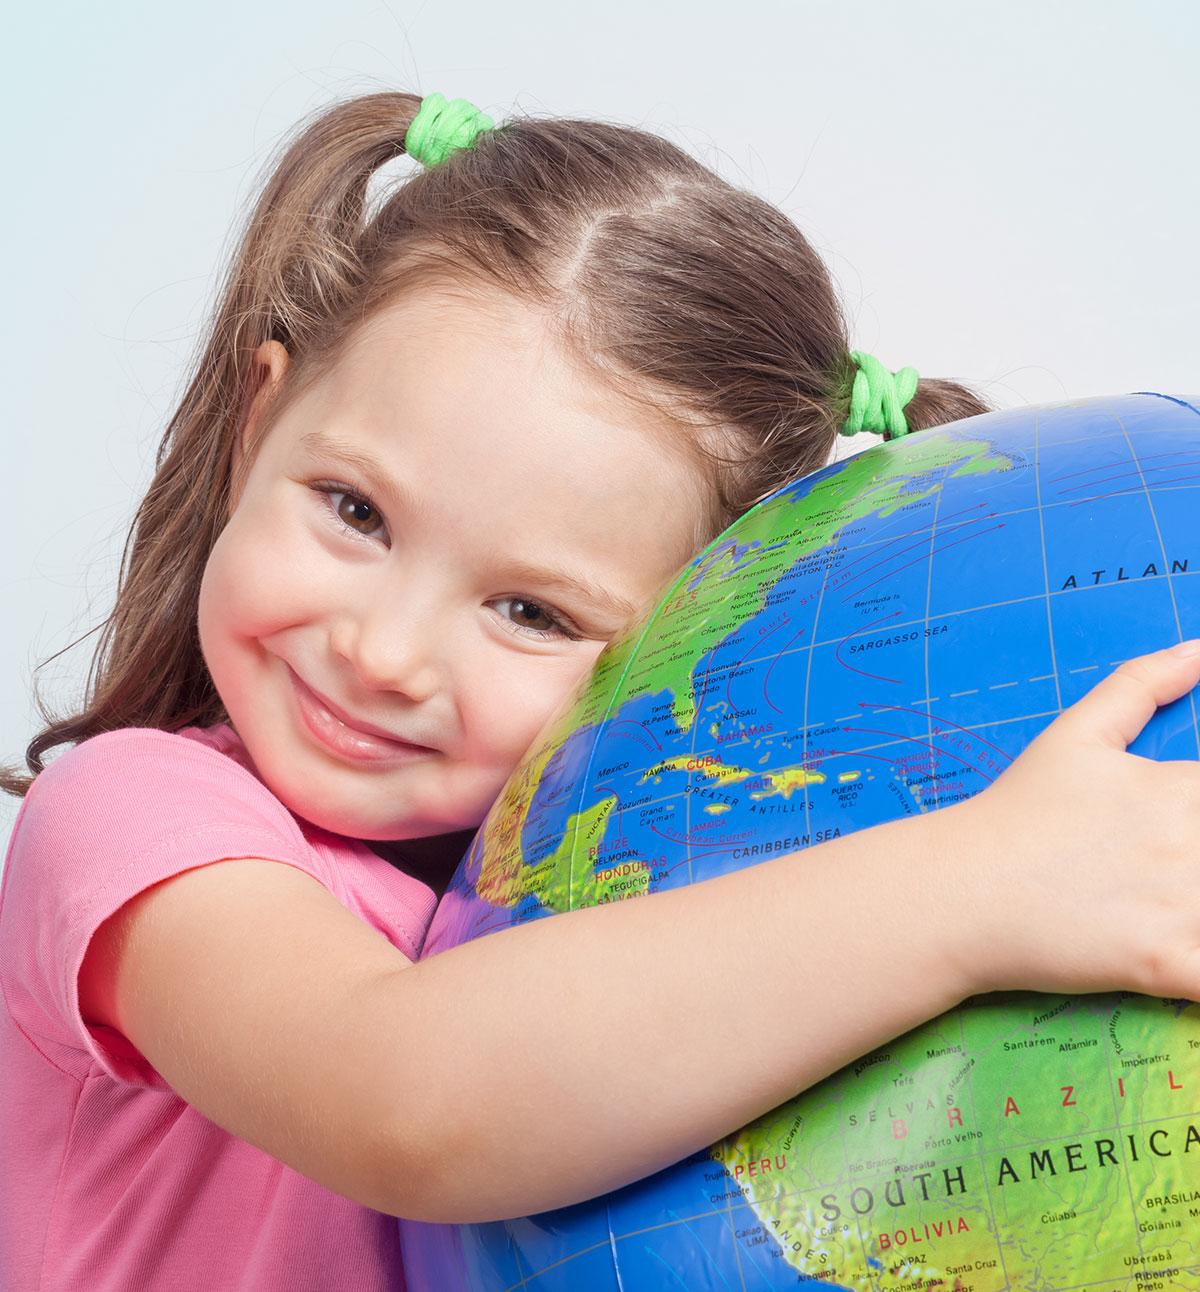 B4School FUN - Alphabet Adventure - E is for Earth